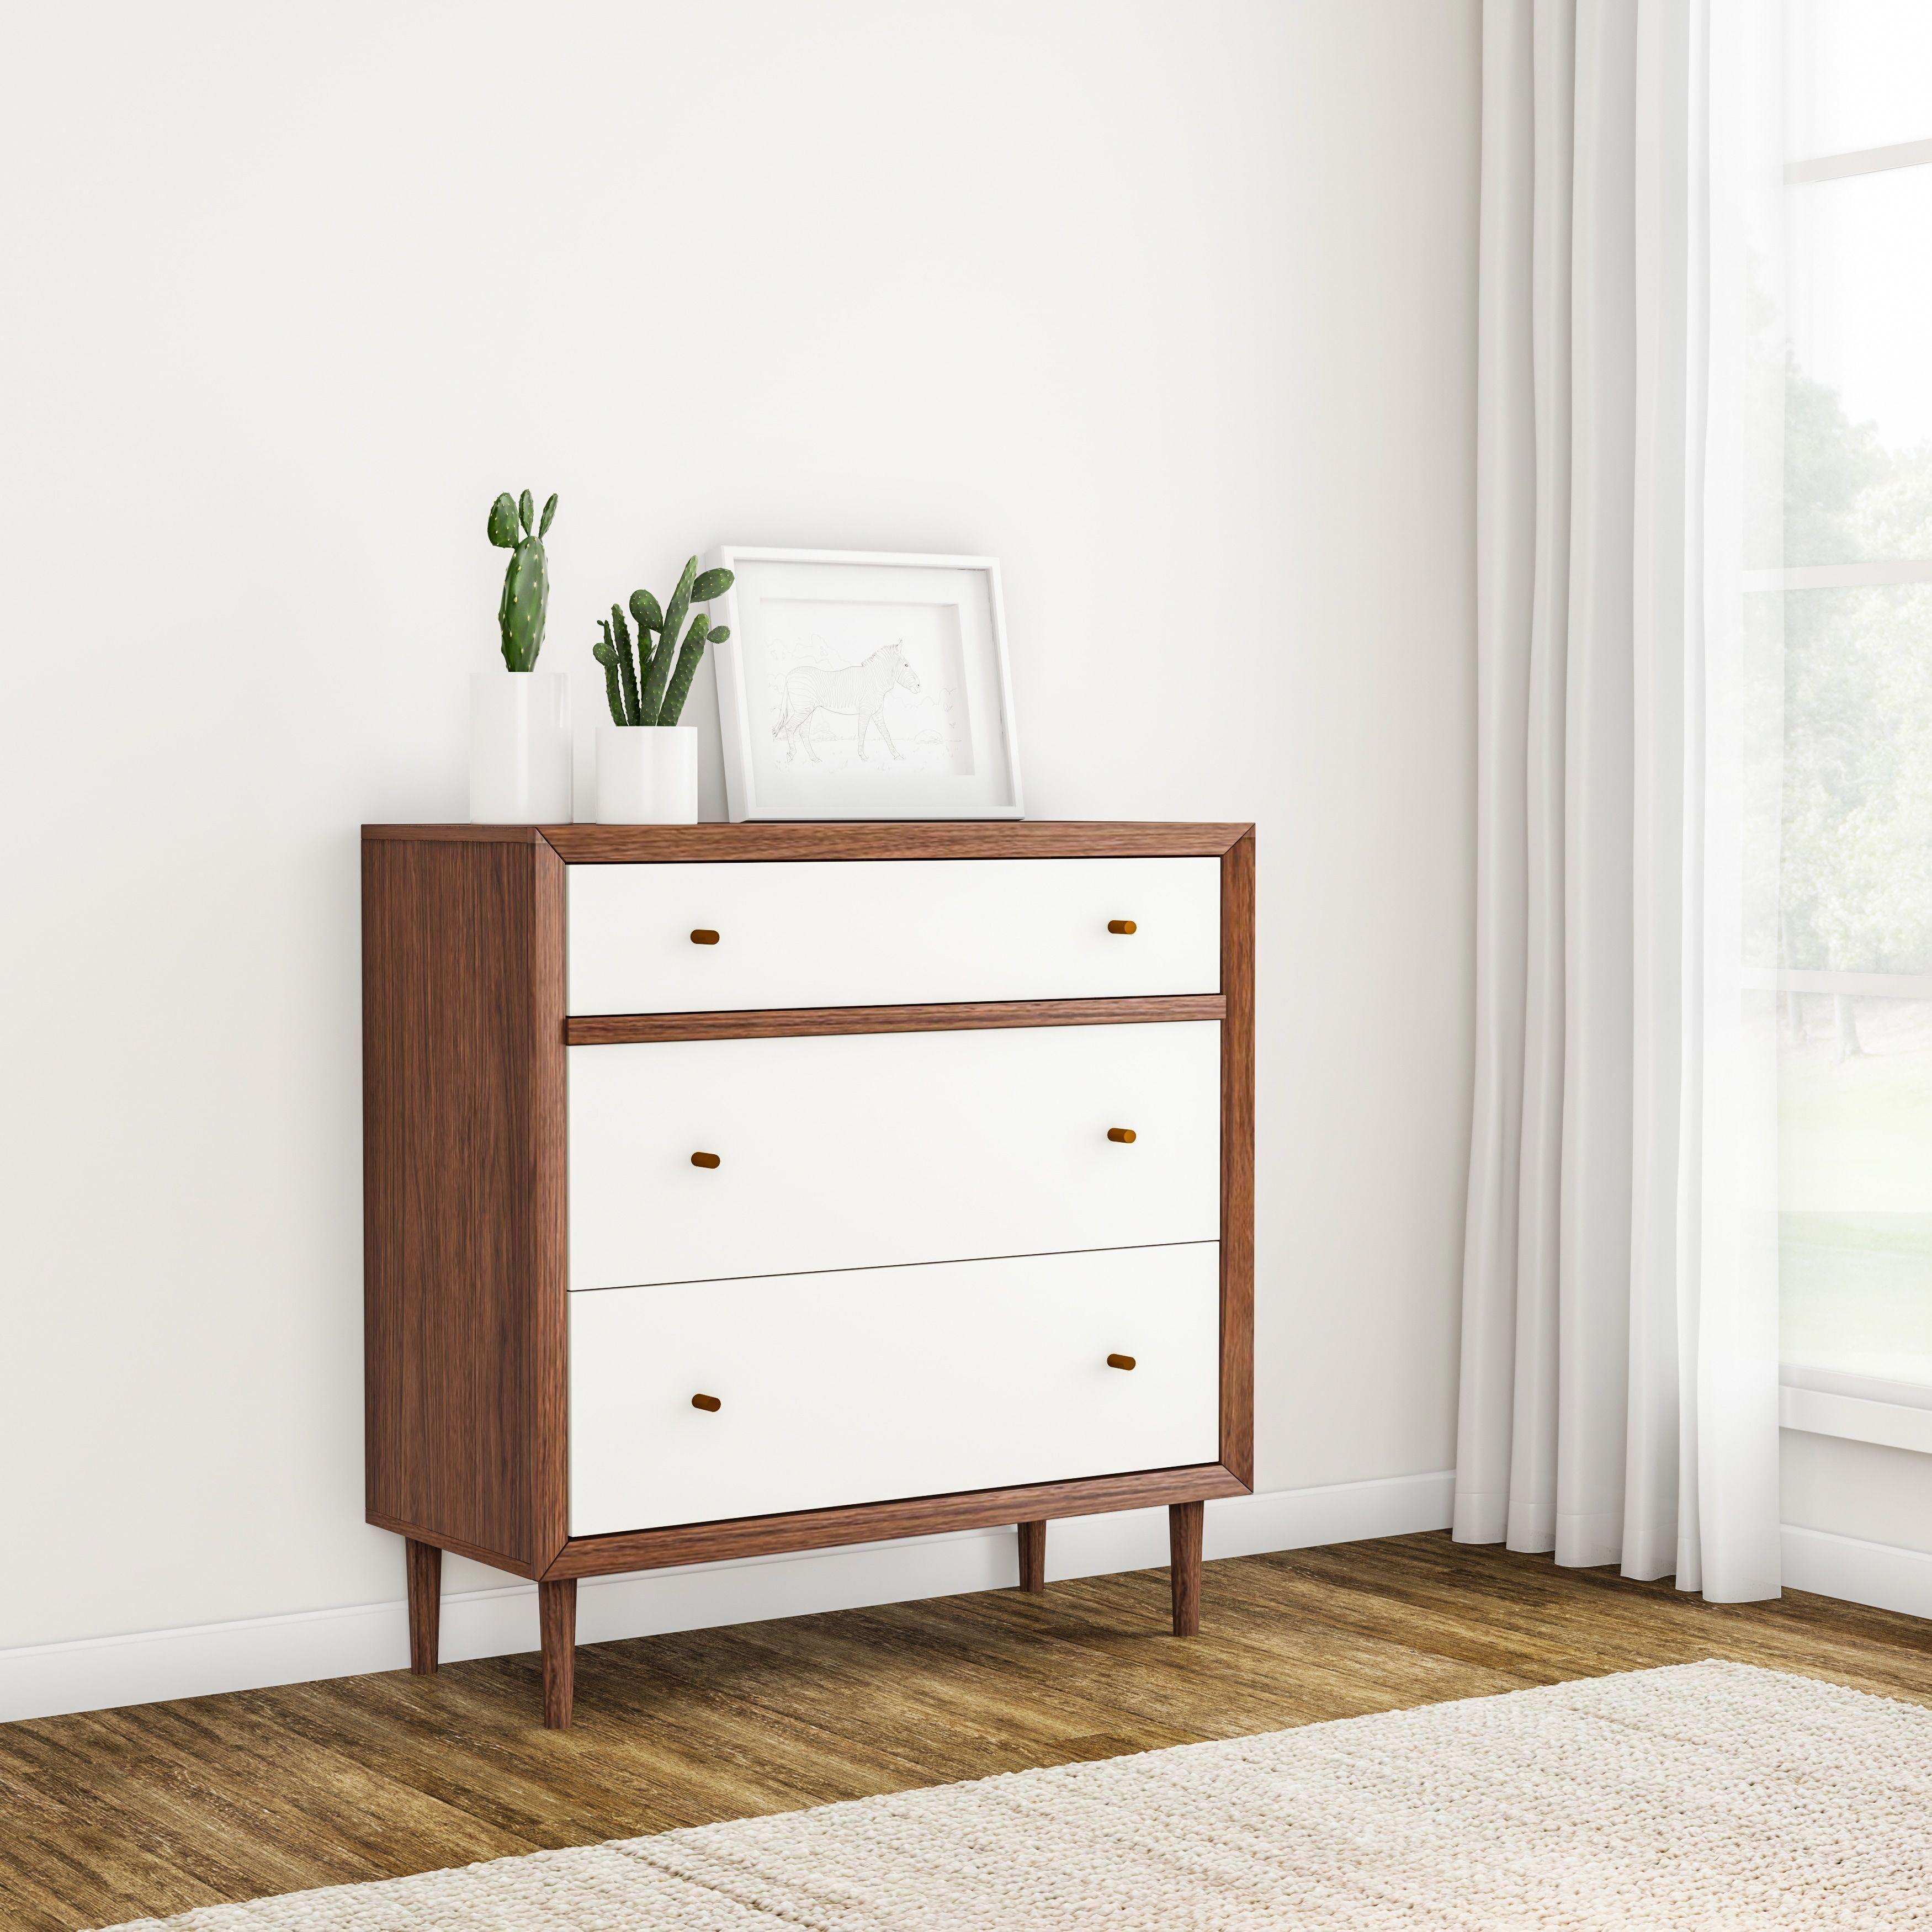 Carson Carrington Trollhattan Mid Century Modern White And Walnut Wood 3 Drawer Chest Chest White Walnut Brow Furniture White Bedroom Furniture Home Furniture